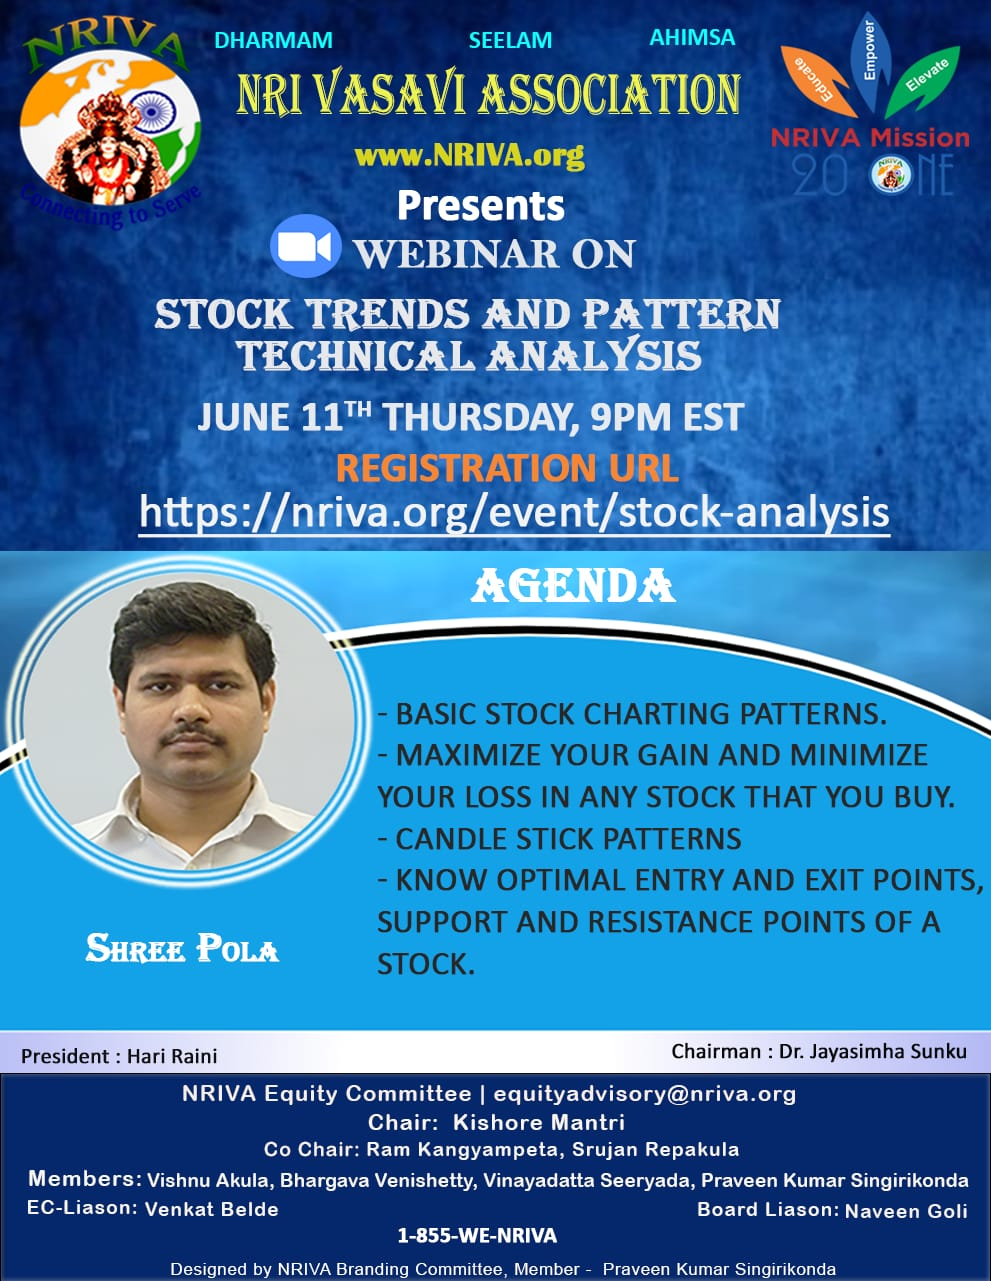 NRIVA Stock Trends/Patterns